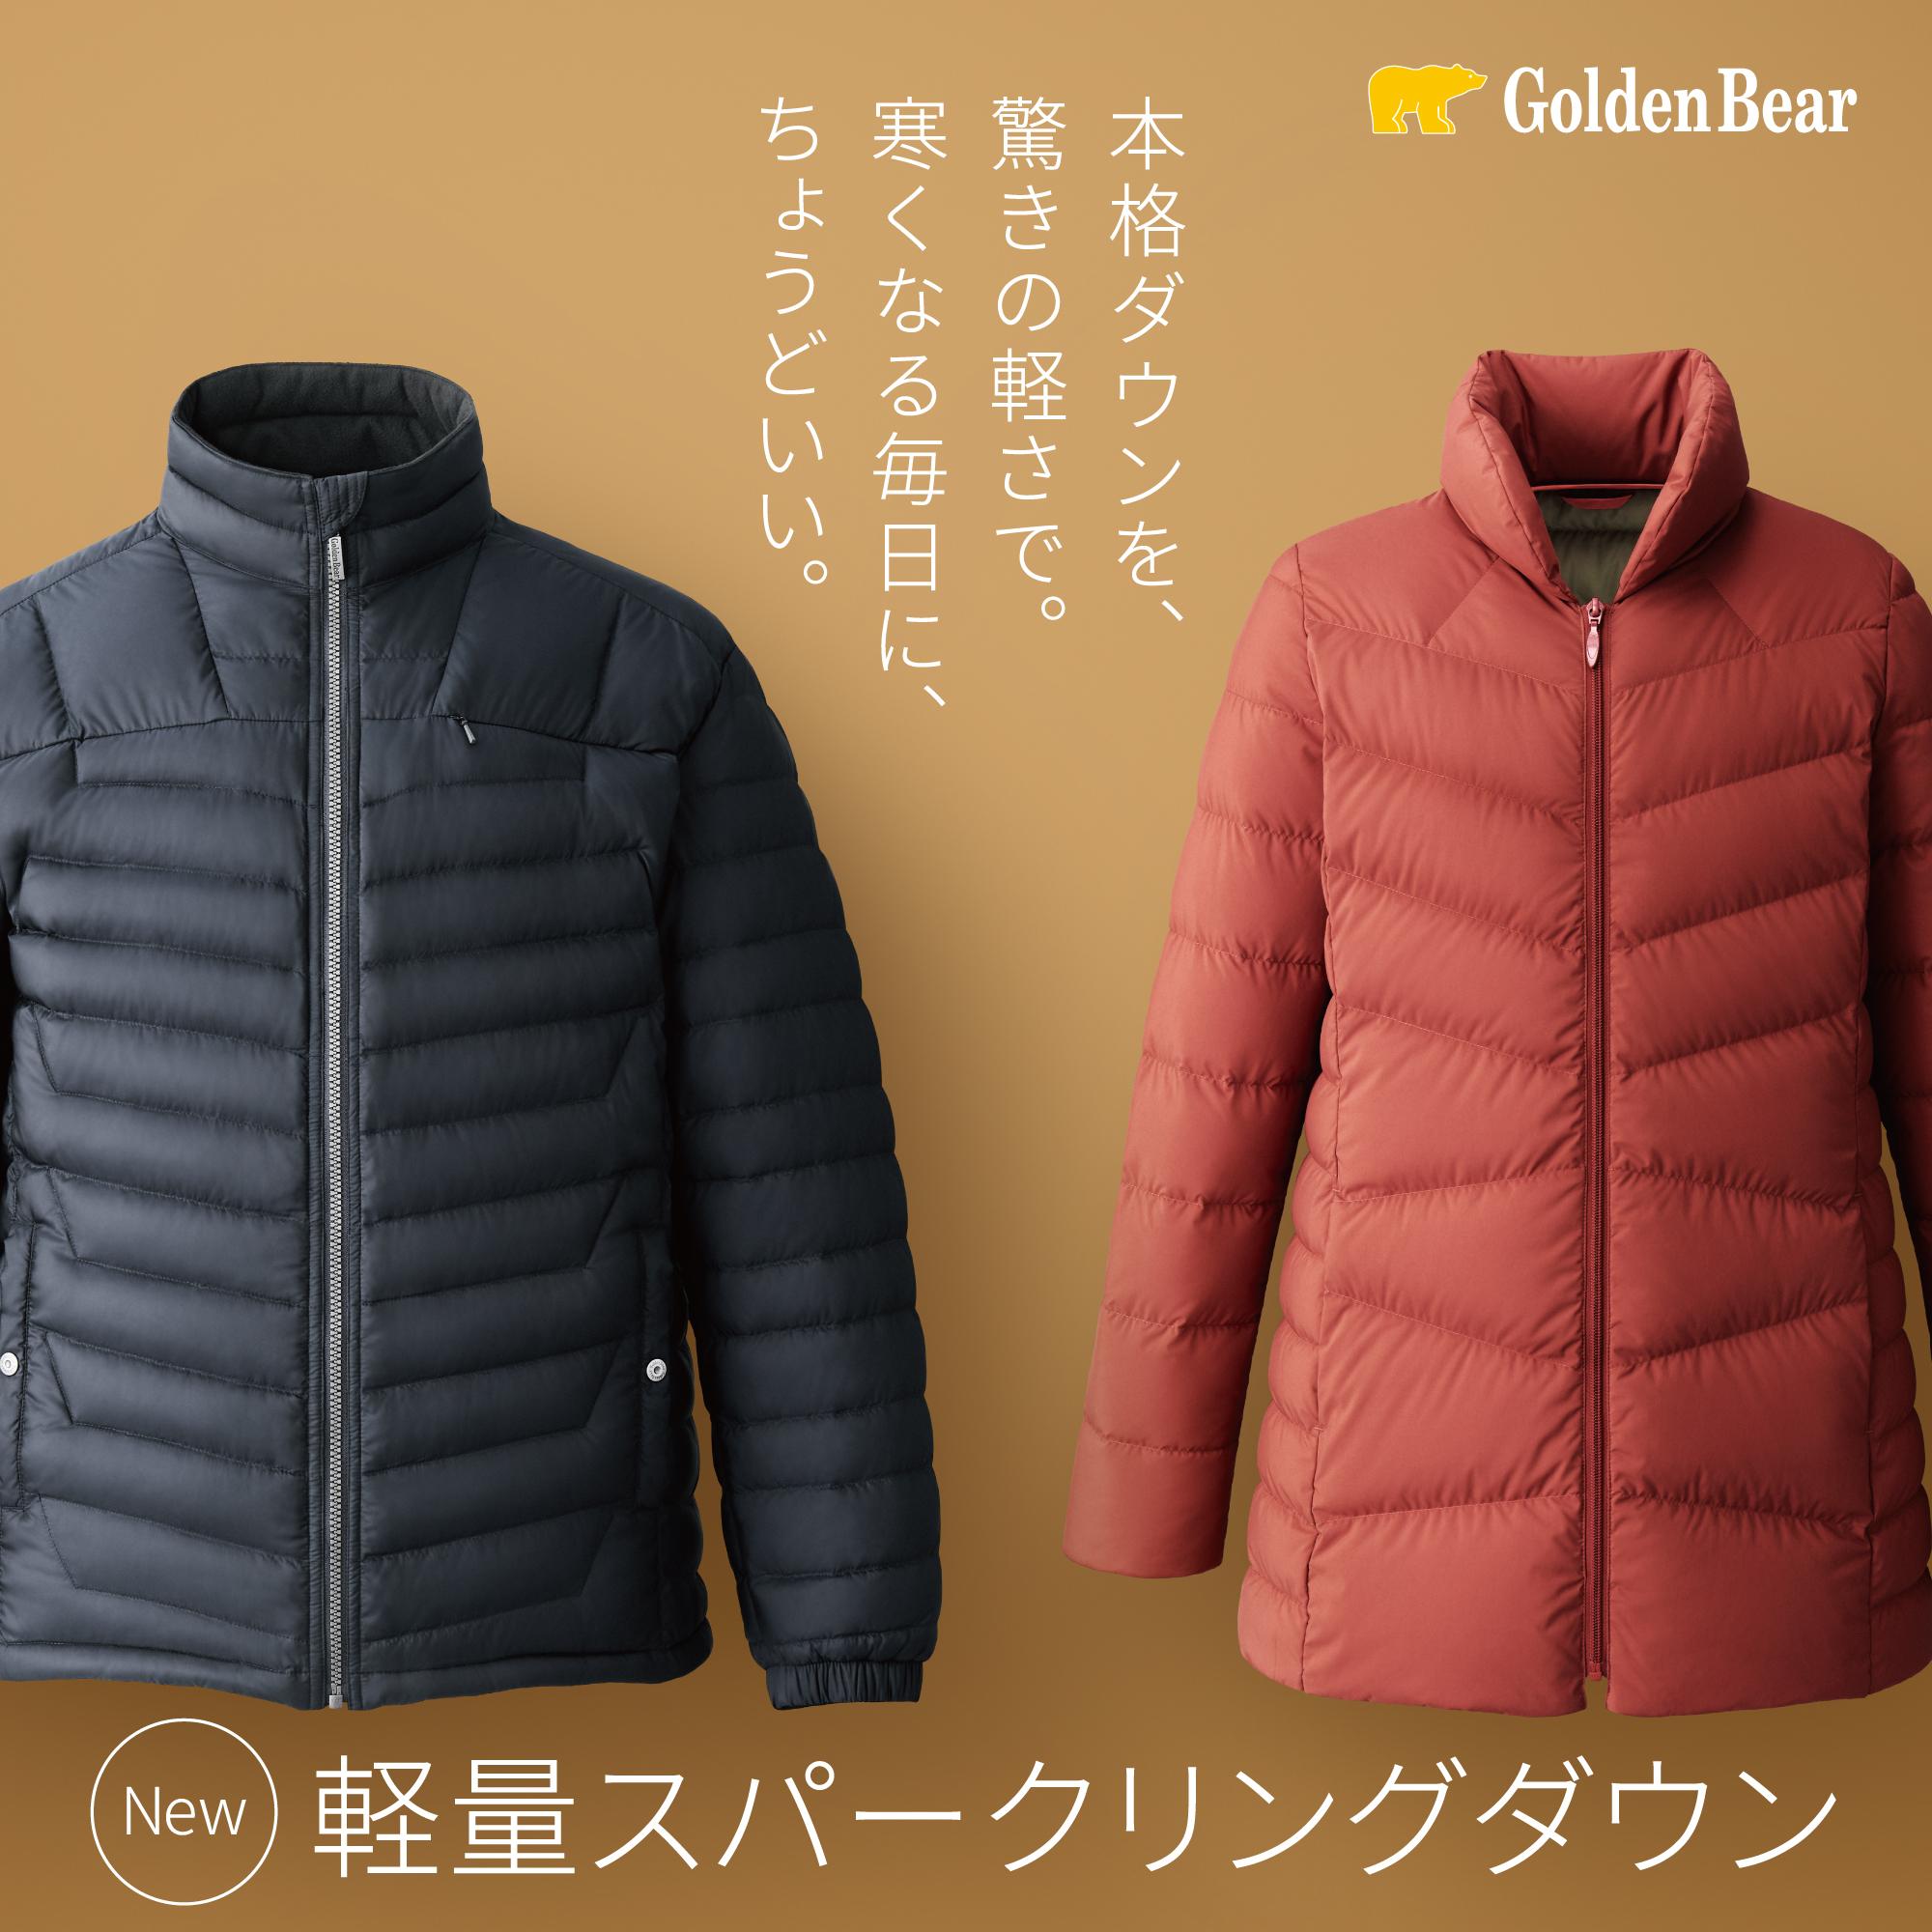 Golden Bear </br>軽量スパークリングダウン